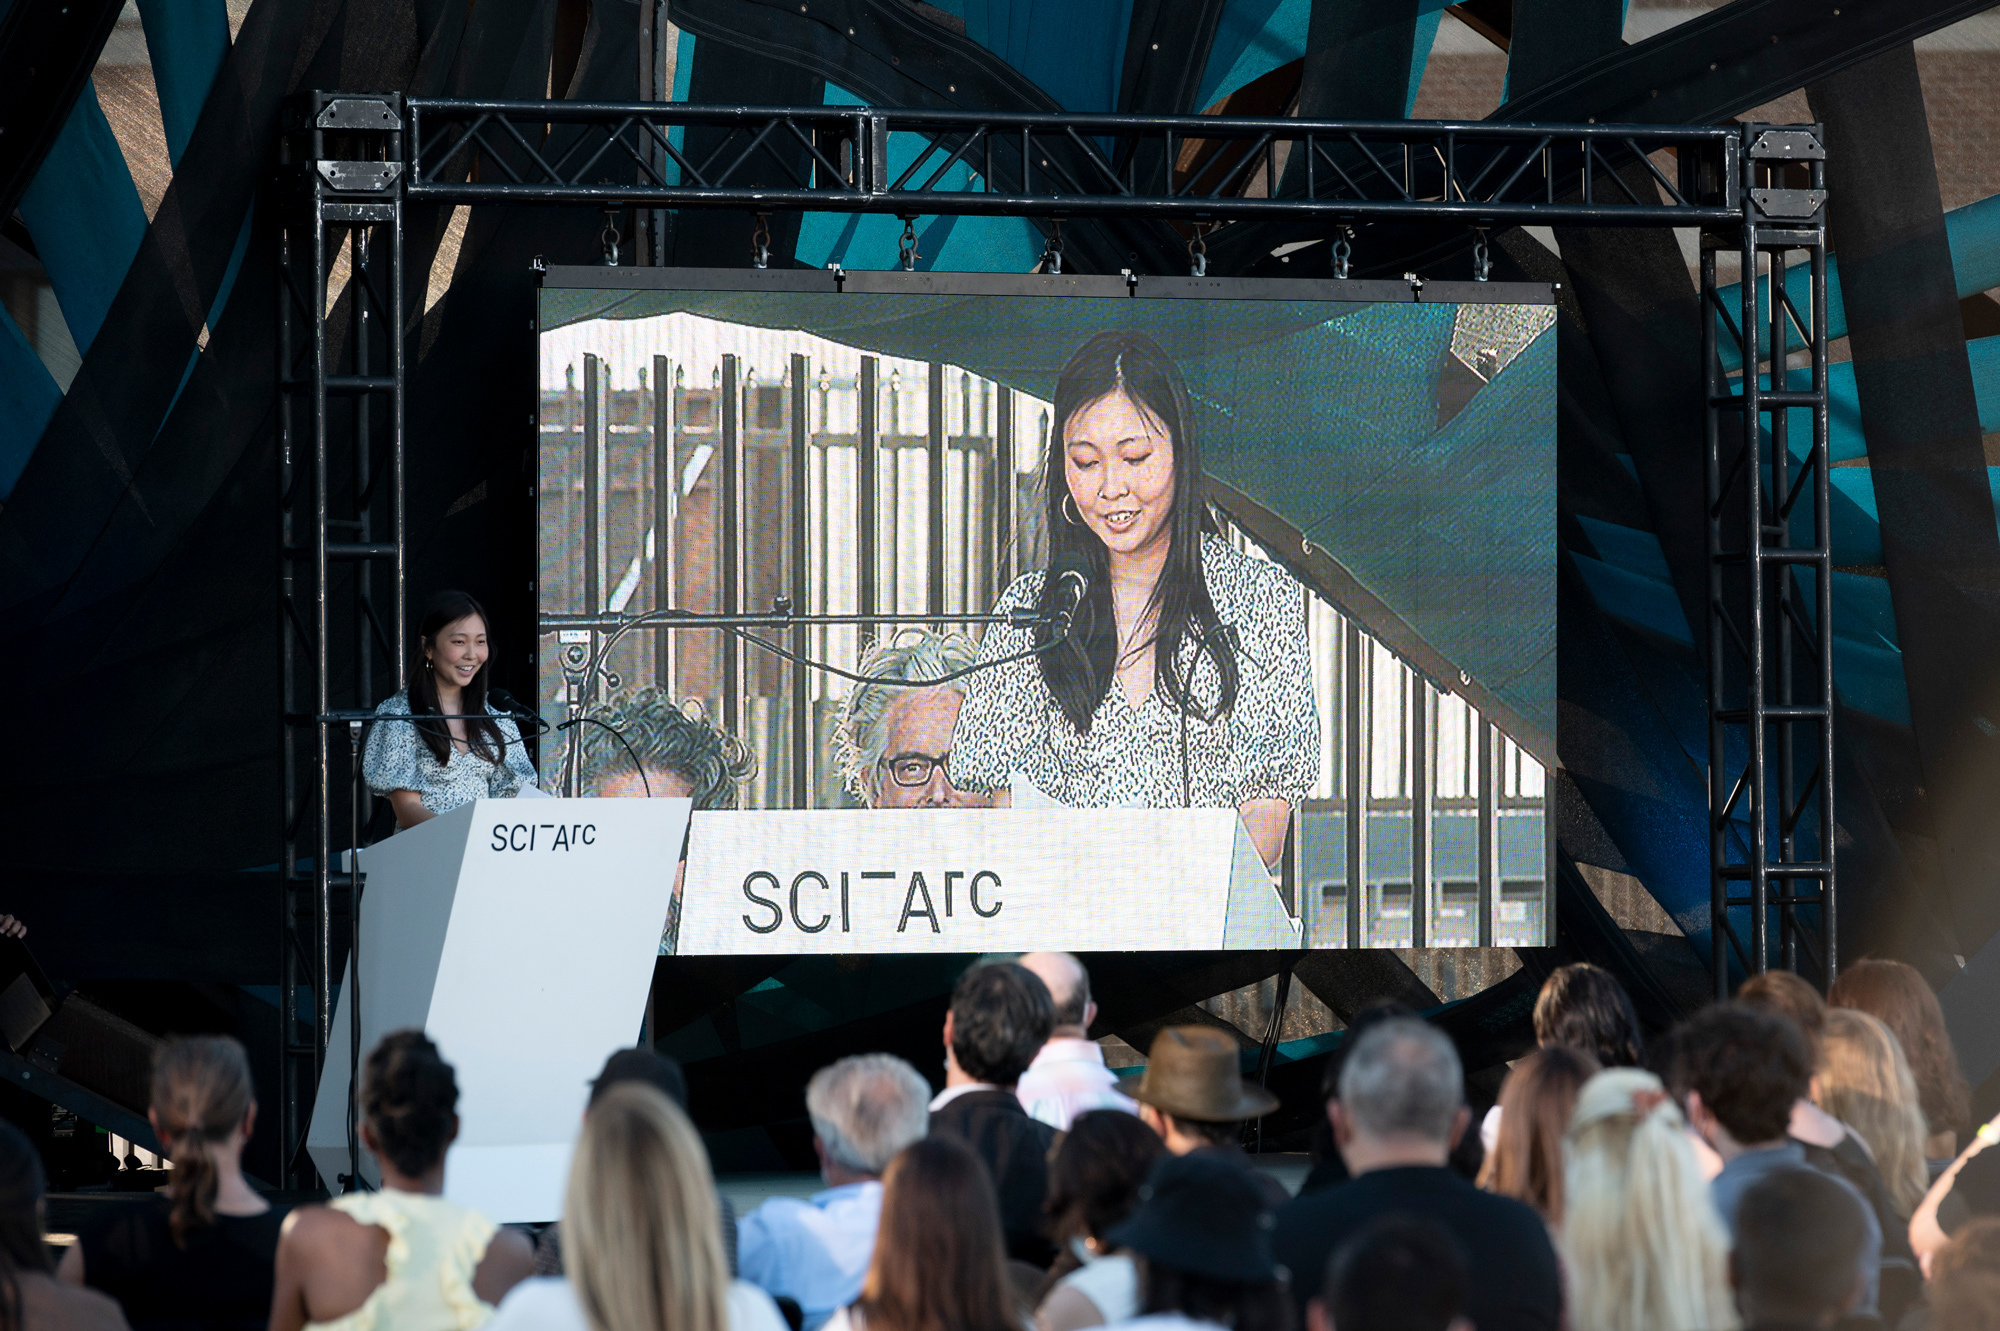 speech screen crowd podium